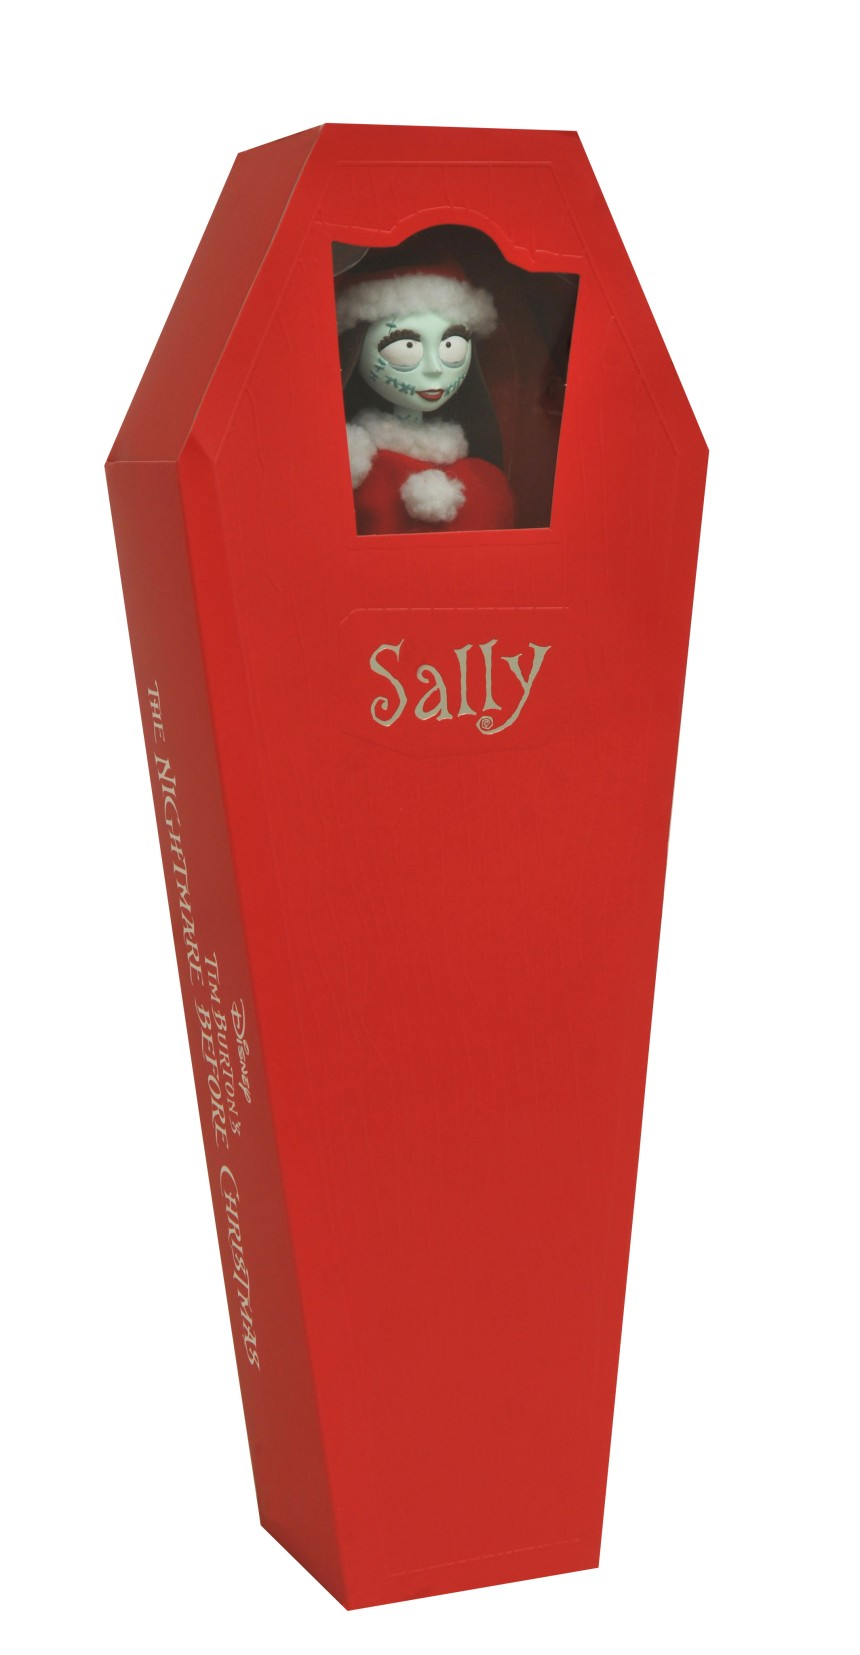 santasallycoffinbox